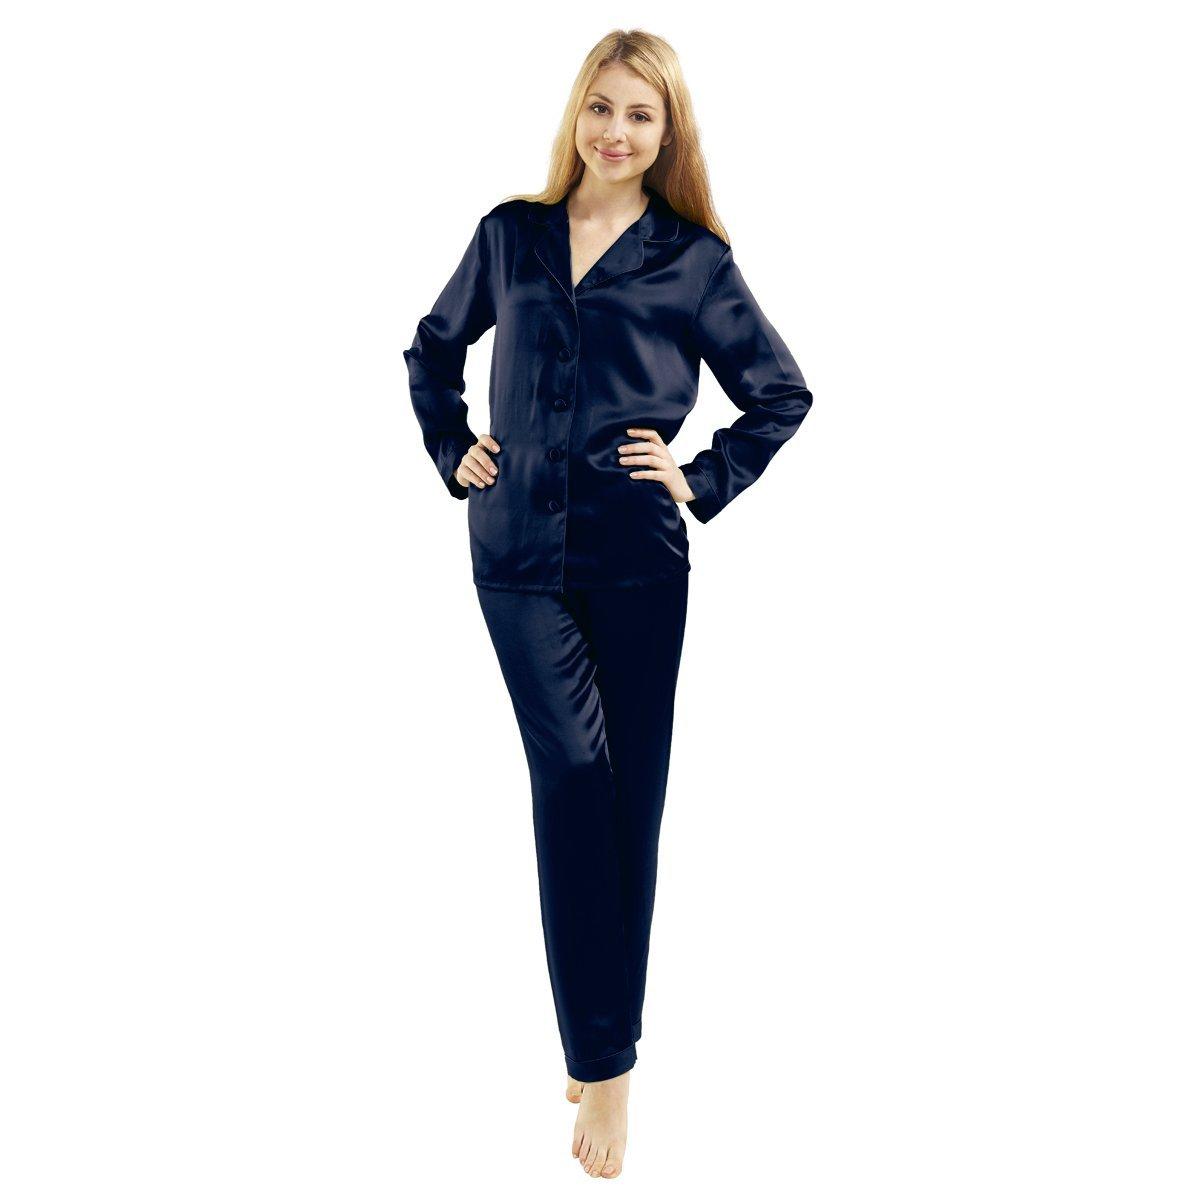 LUXUER Women's Handmade Pure Mulberry Silk Pajama Set Classic Luxury Large Navy Blue